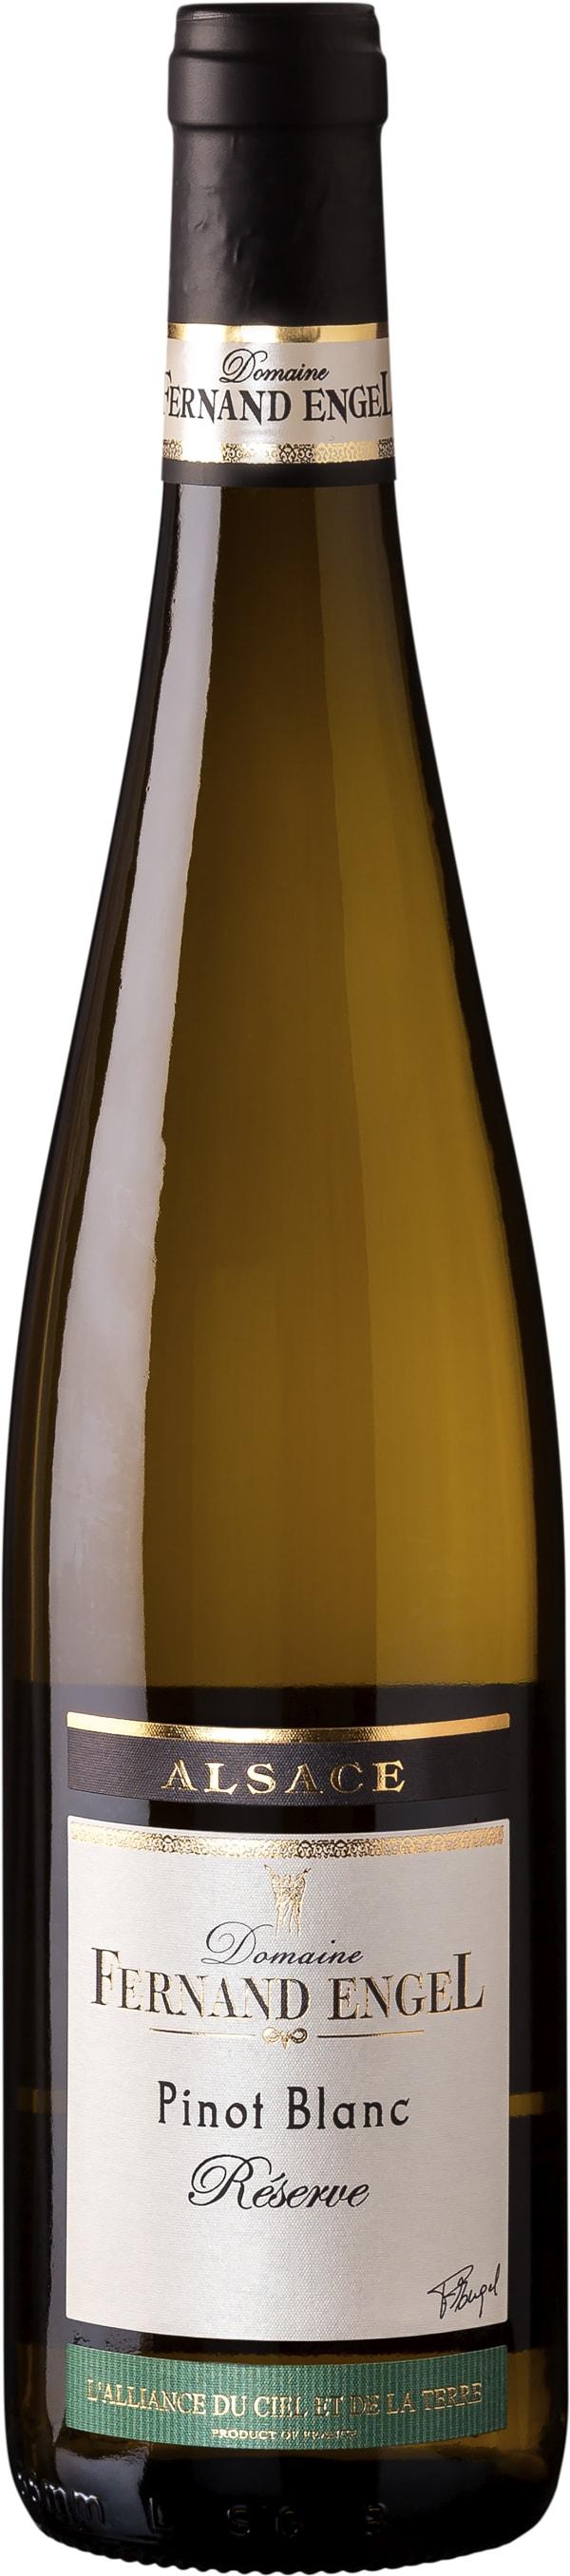 Fernand Engel Pinot Blanc Réserve 2017